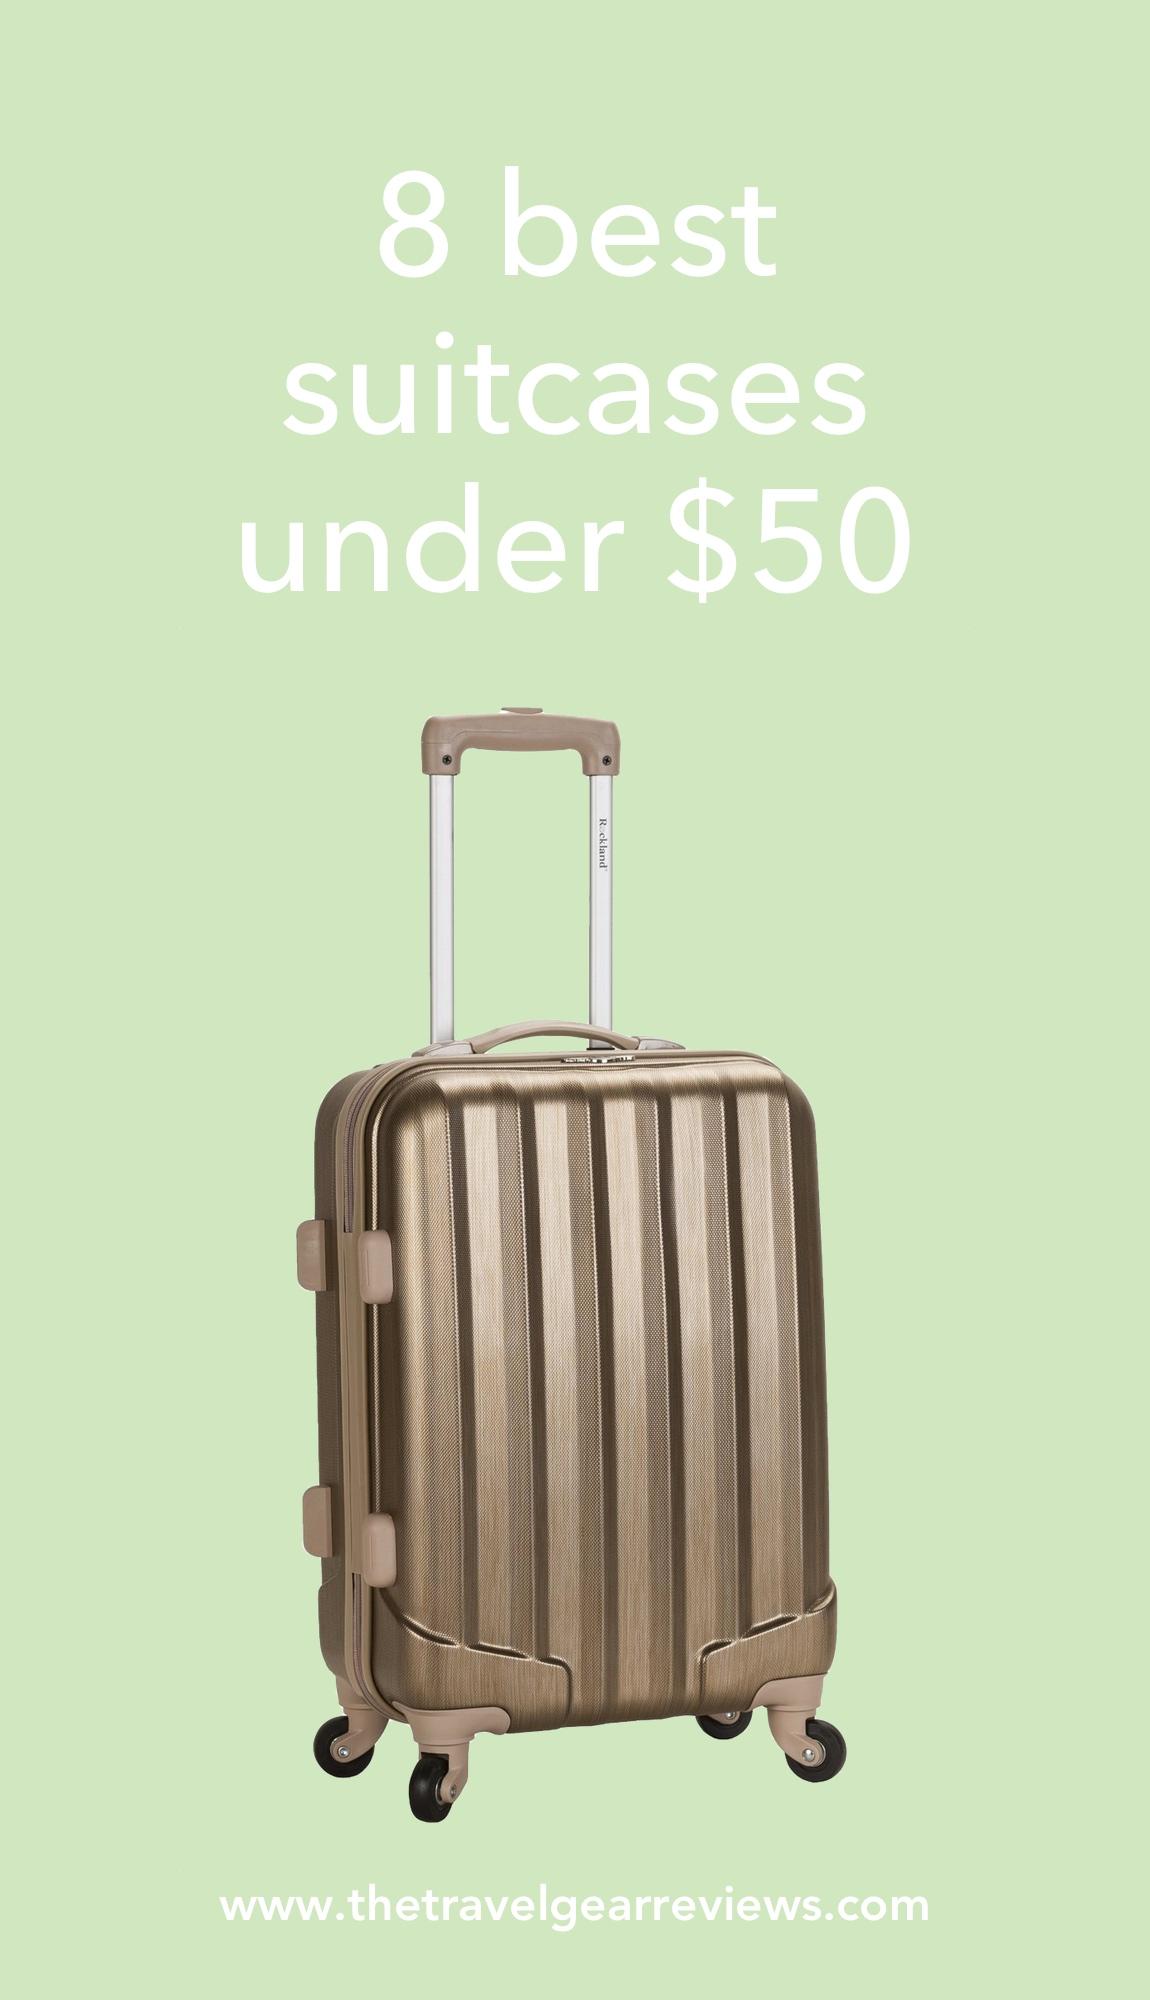 8 best suitcases under $50